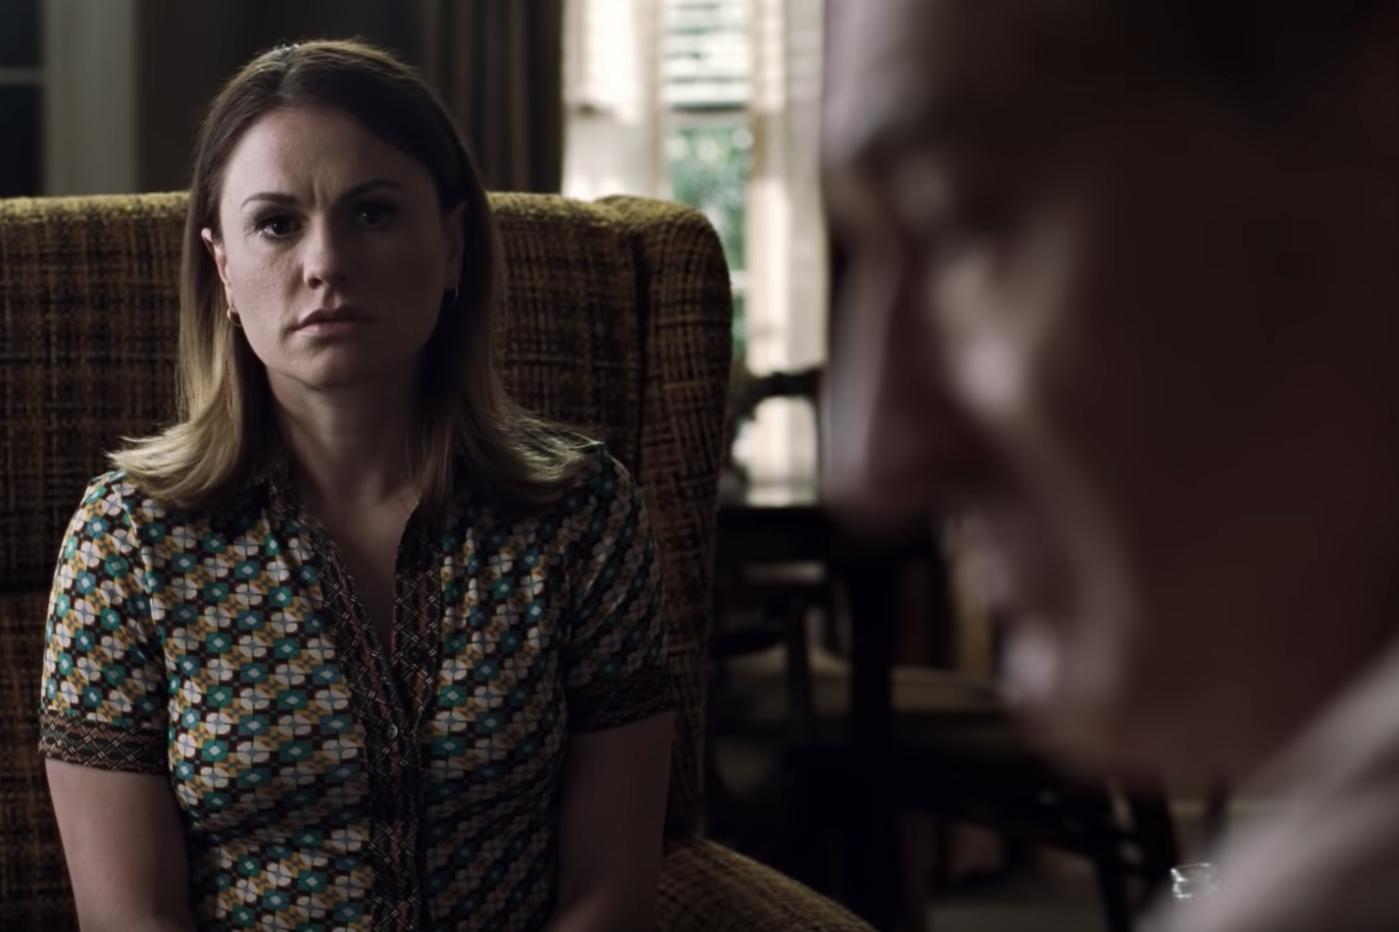 The Irishman: Robert De Niro insists Anna Paquin has 'powerful' role despite only saying seven words